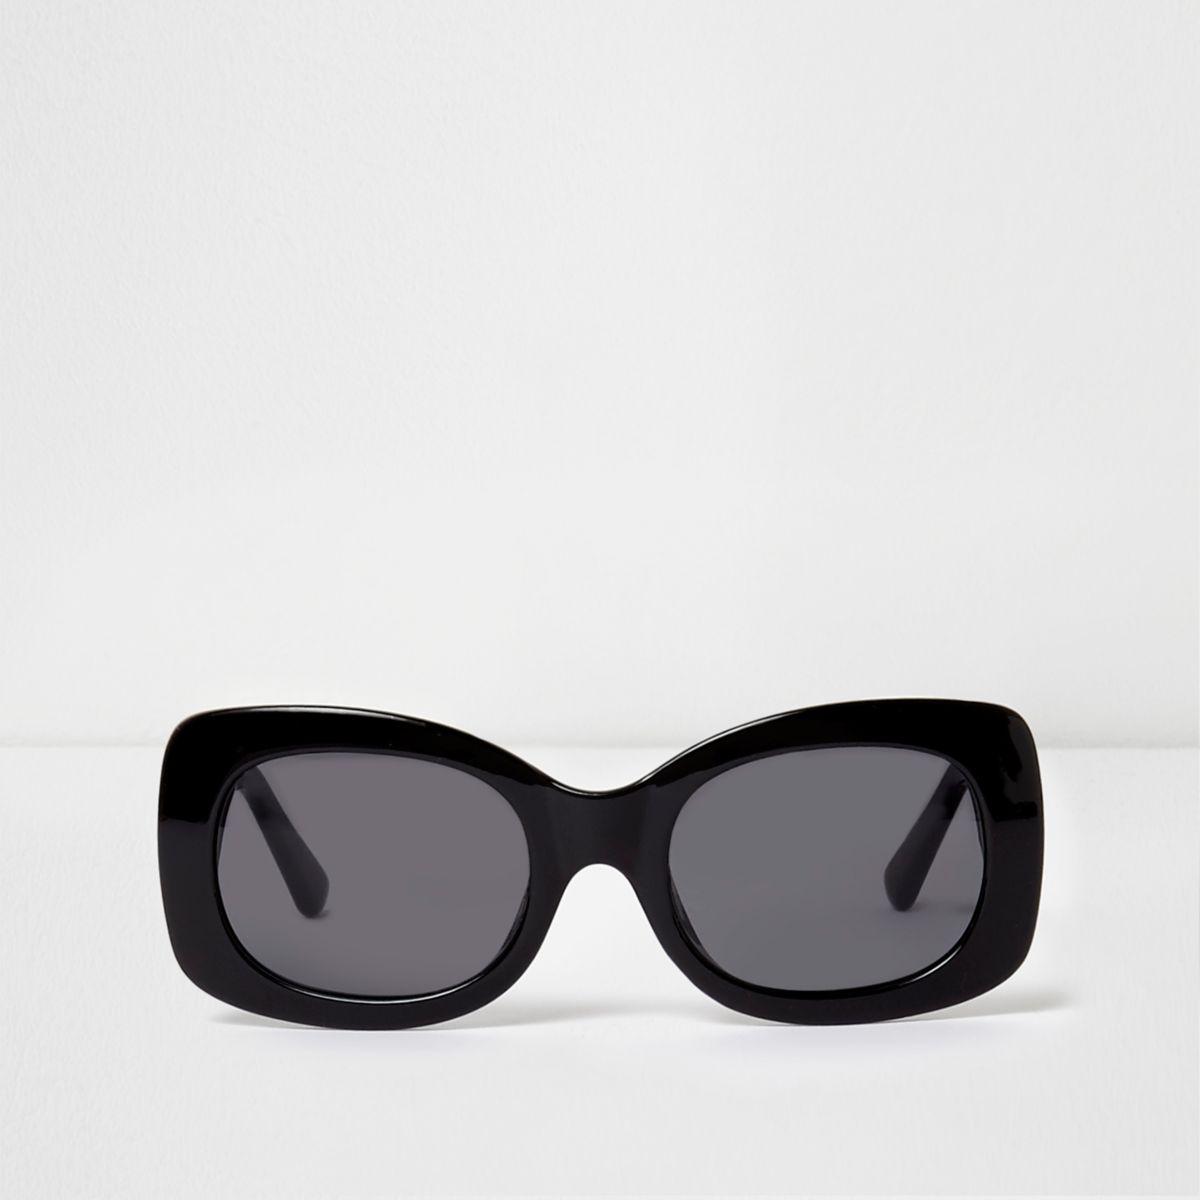 Zwarte glamour zonnebril met vierkant montuur